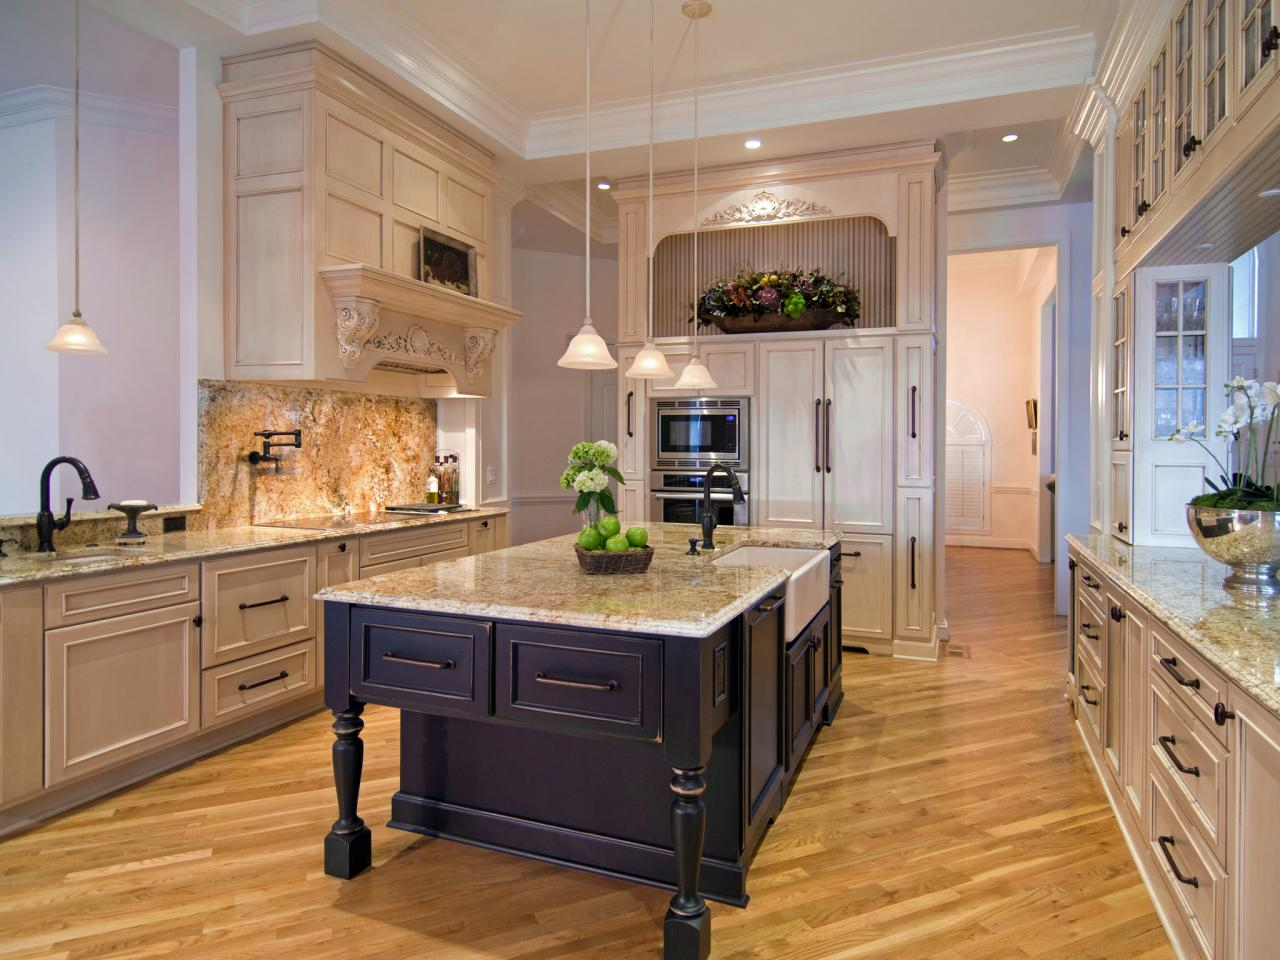 Kitchen_model.jpg